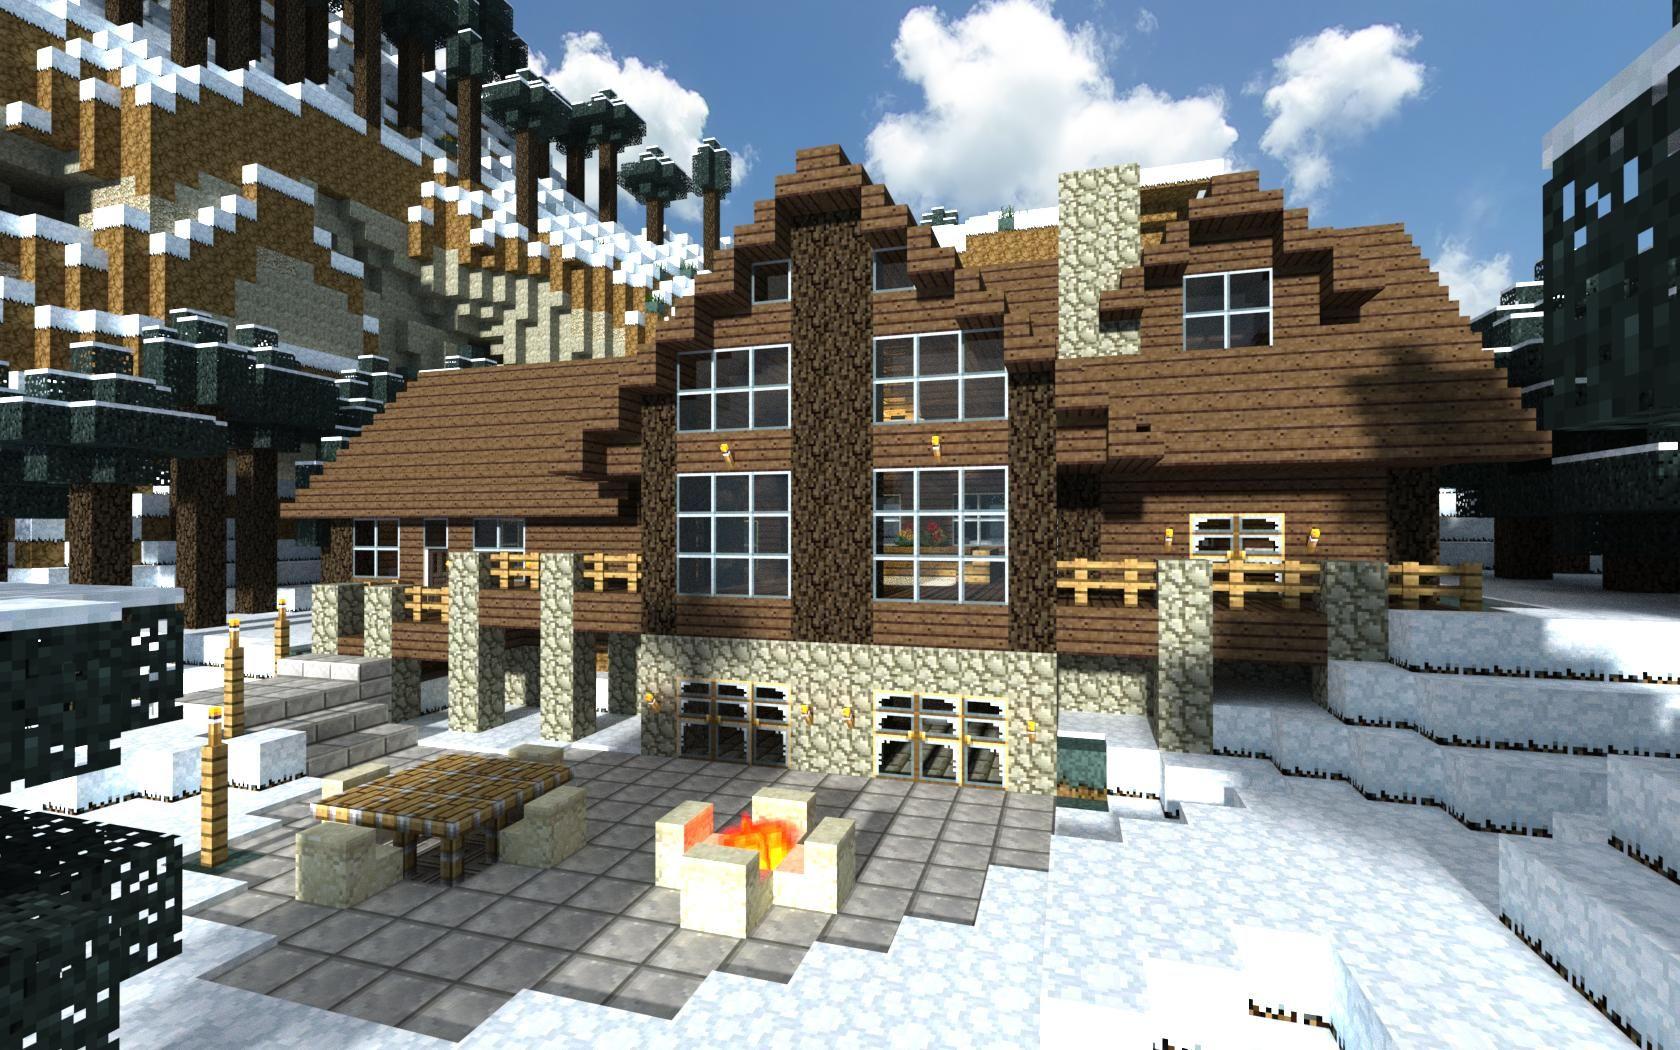 Minecraft Россия — портал о Minecraft, Starbound и инди-играх